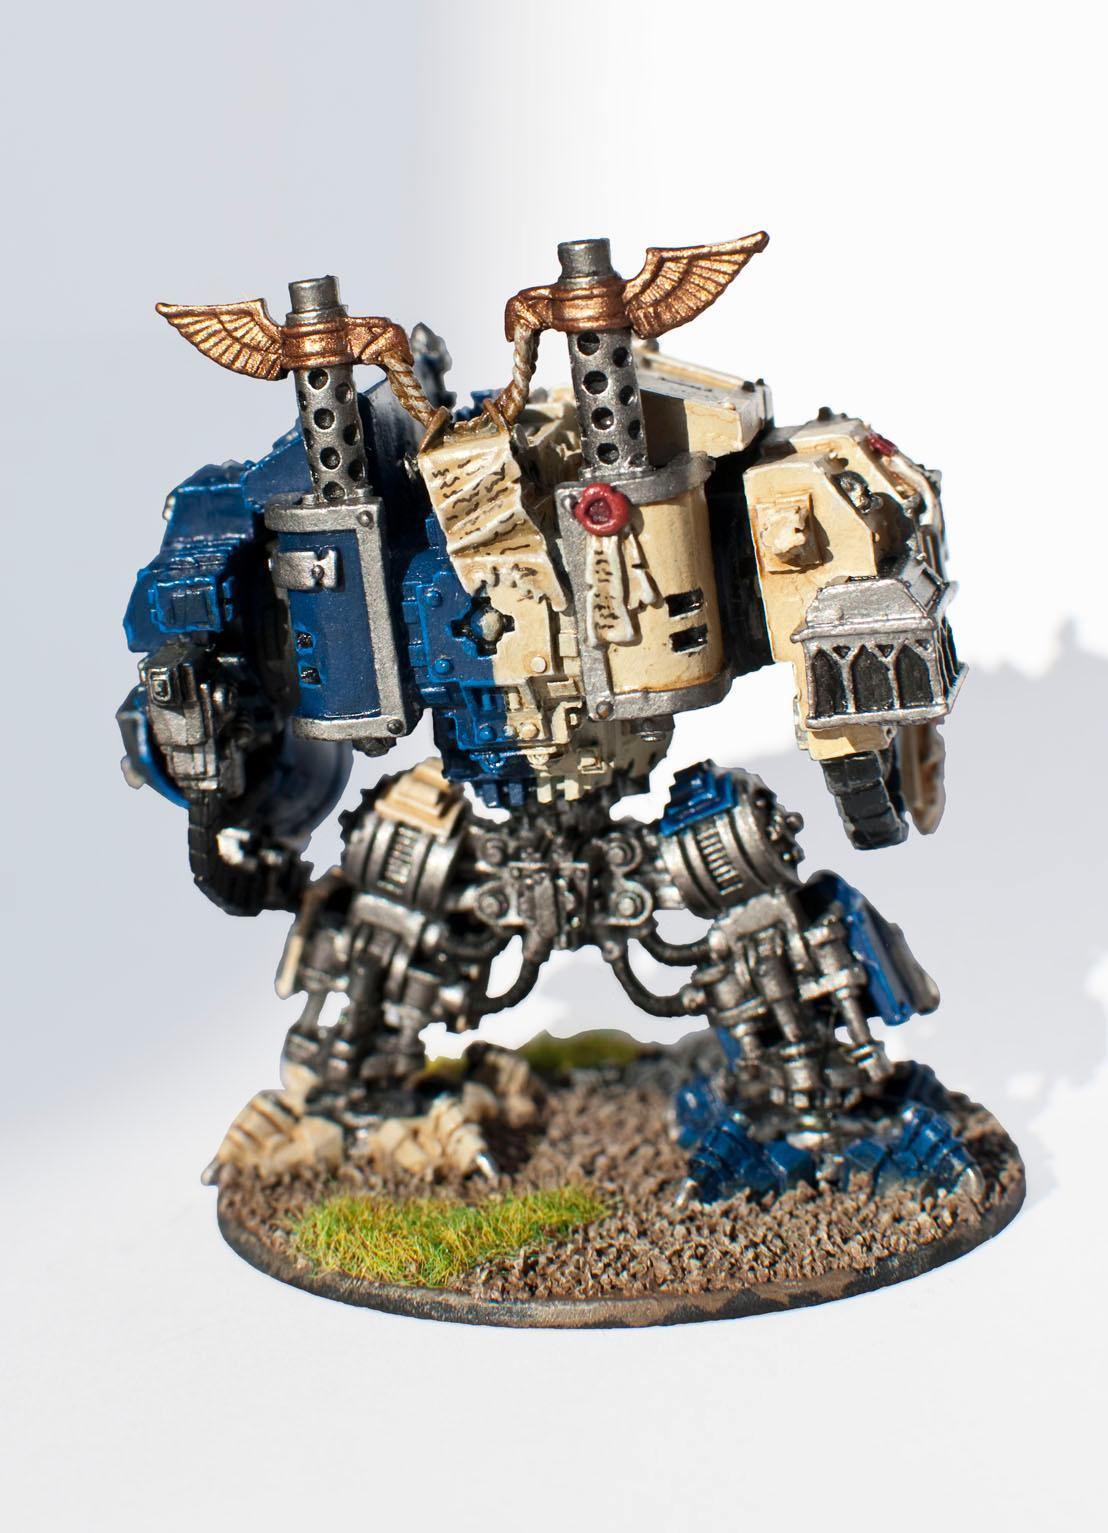 Badab War, Dreadnought, Librarian, Novamarines, Razorback, Space Marines